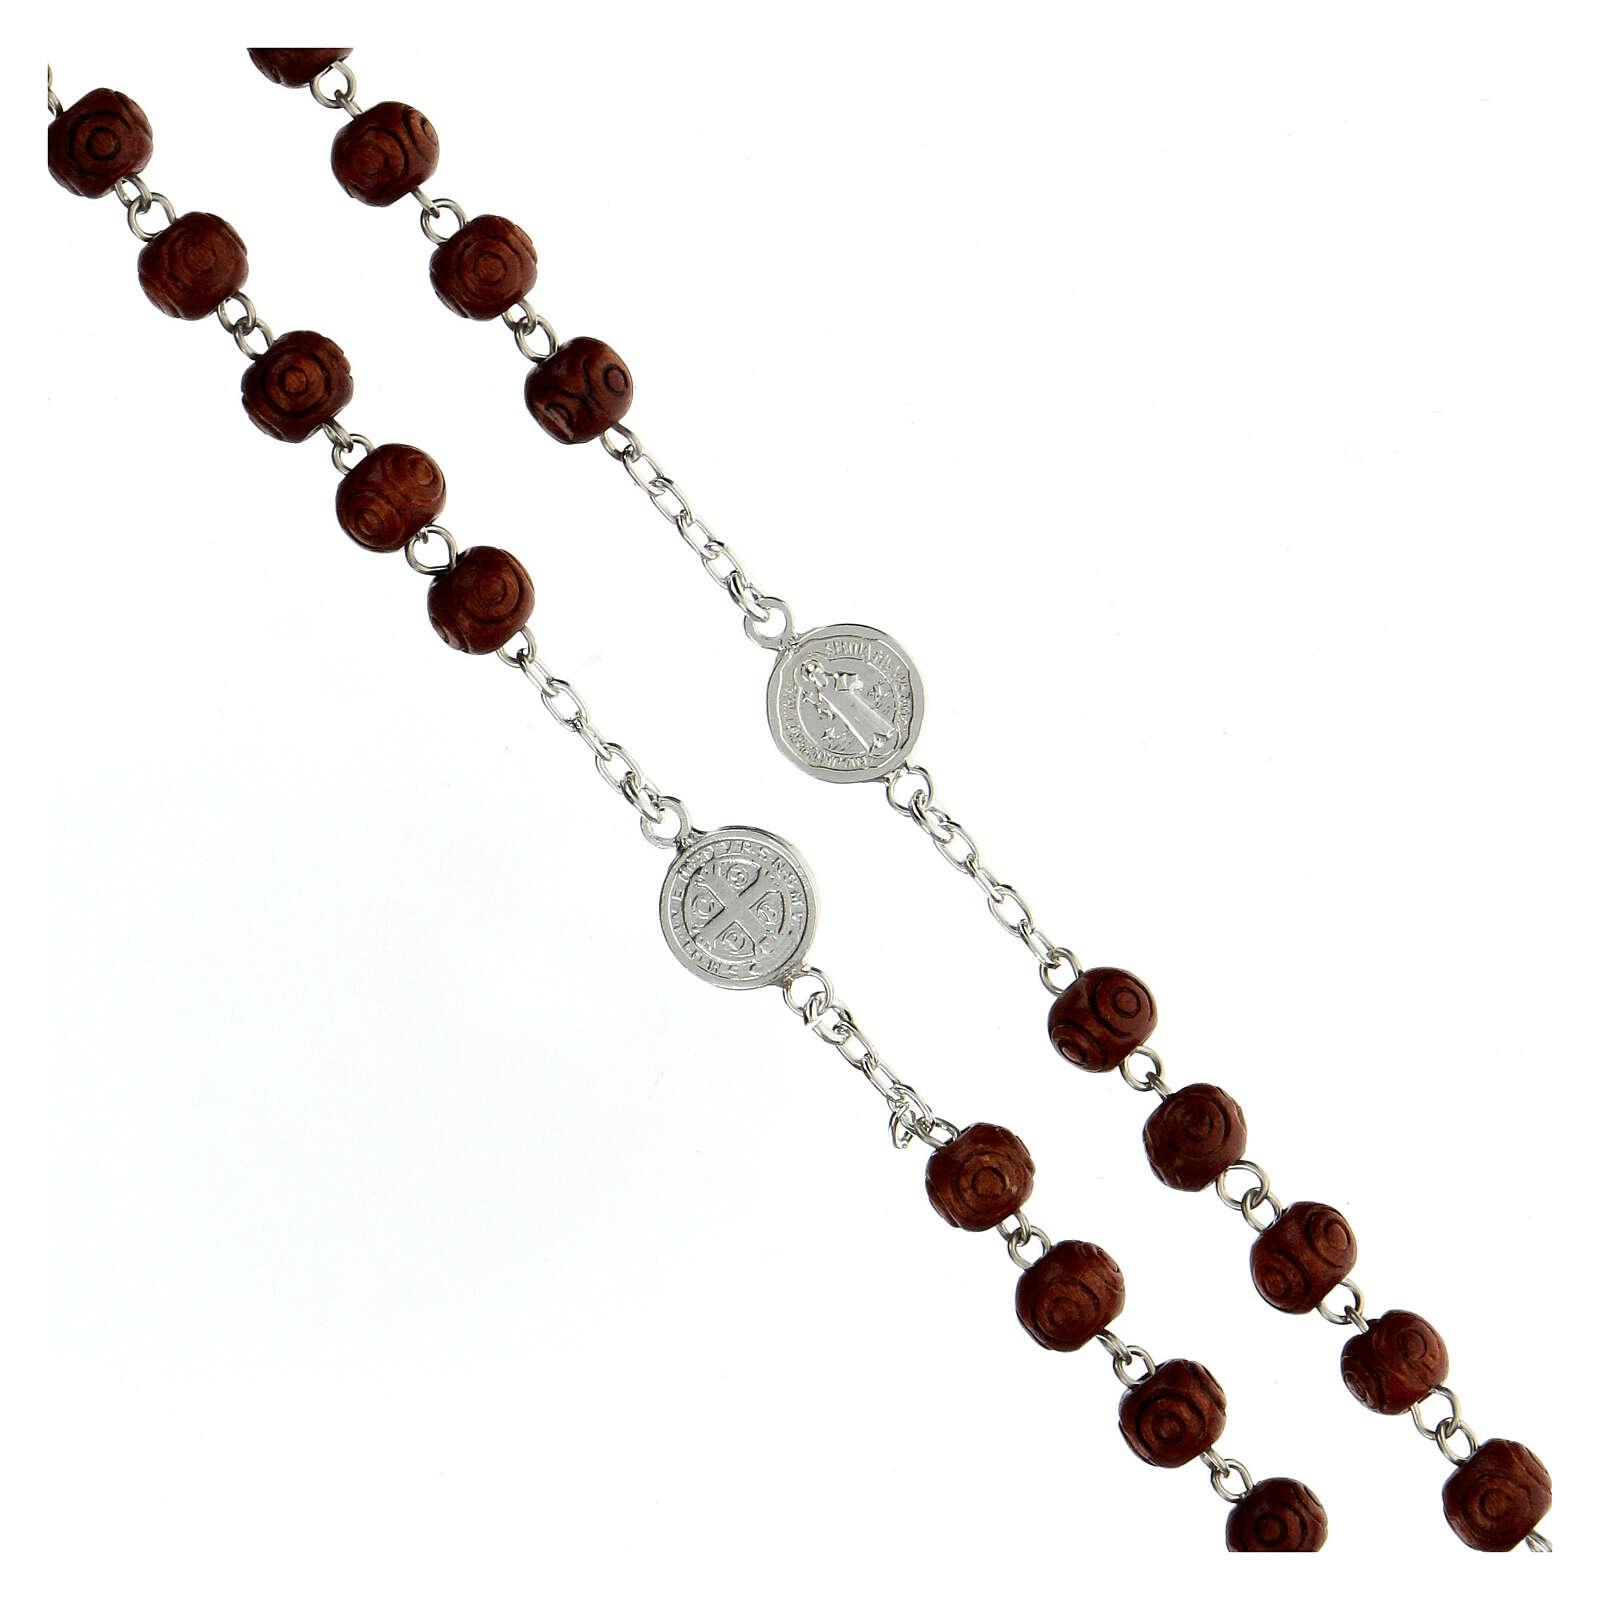 Rosario plata 925 medallas San Benito granos madera 7 mm 4